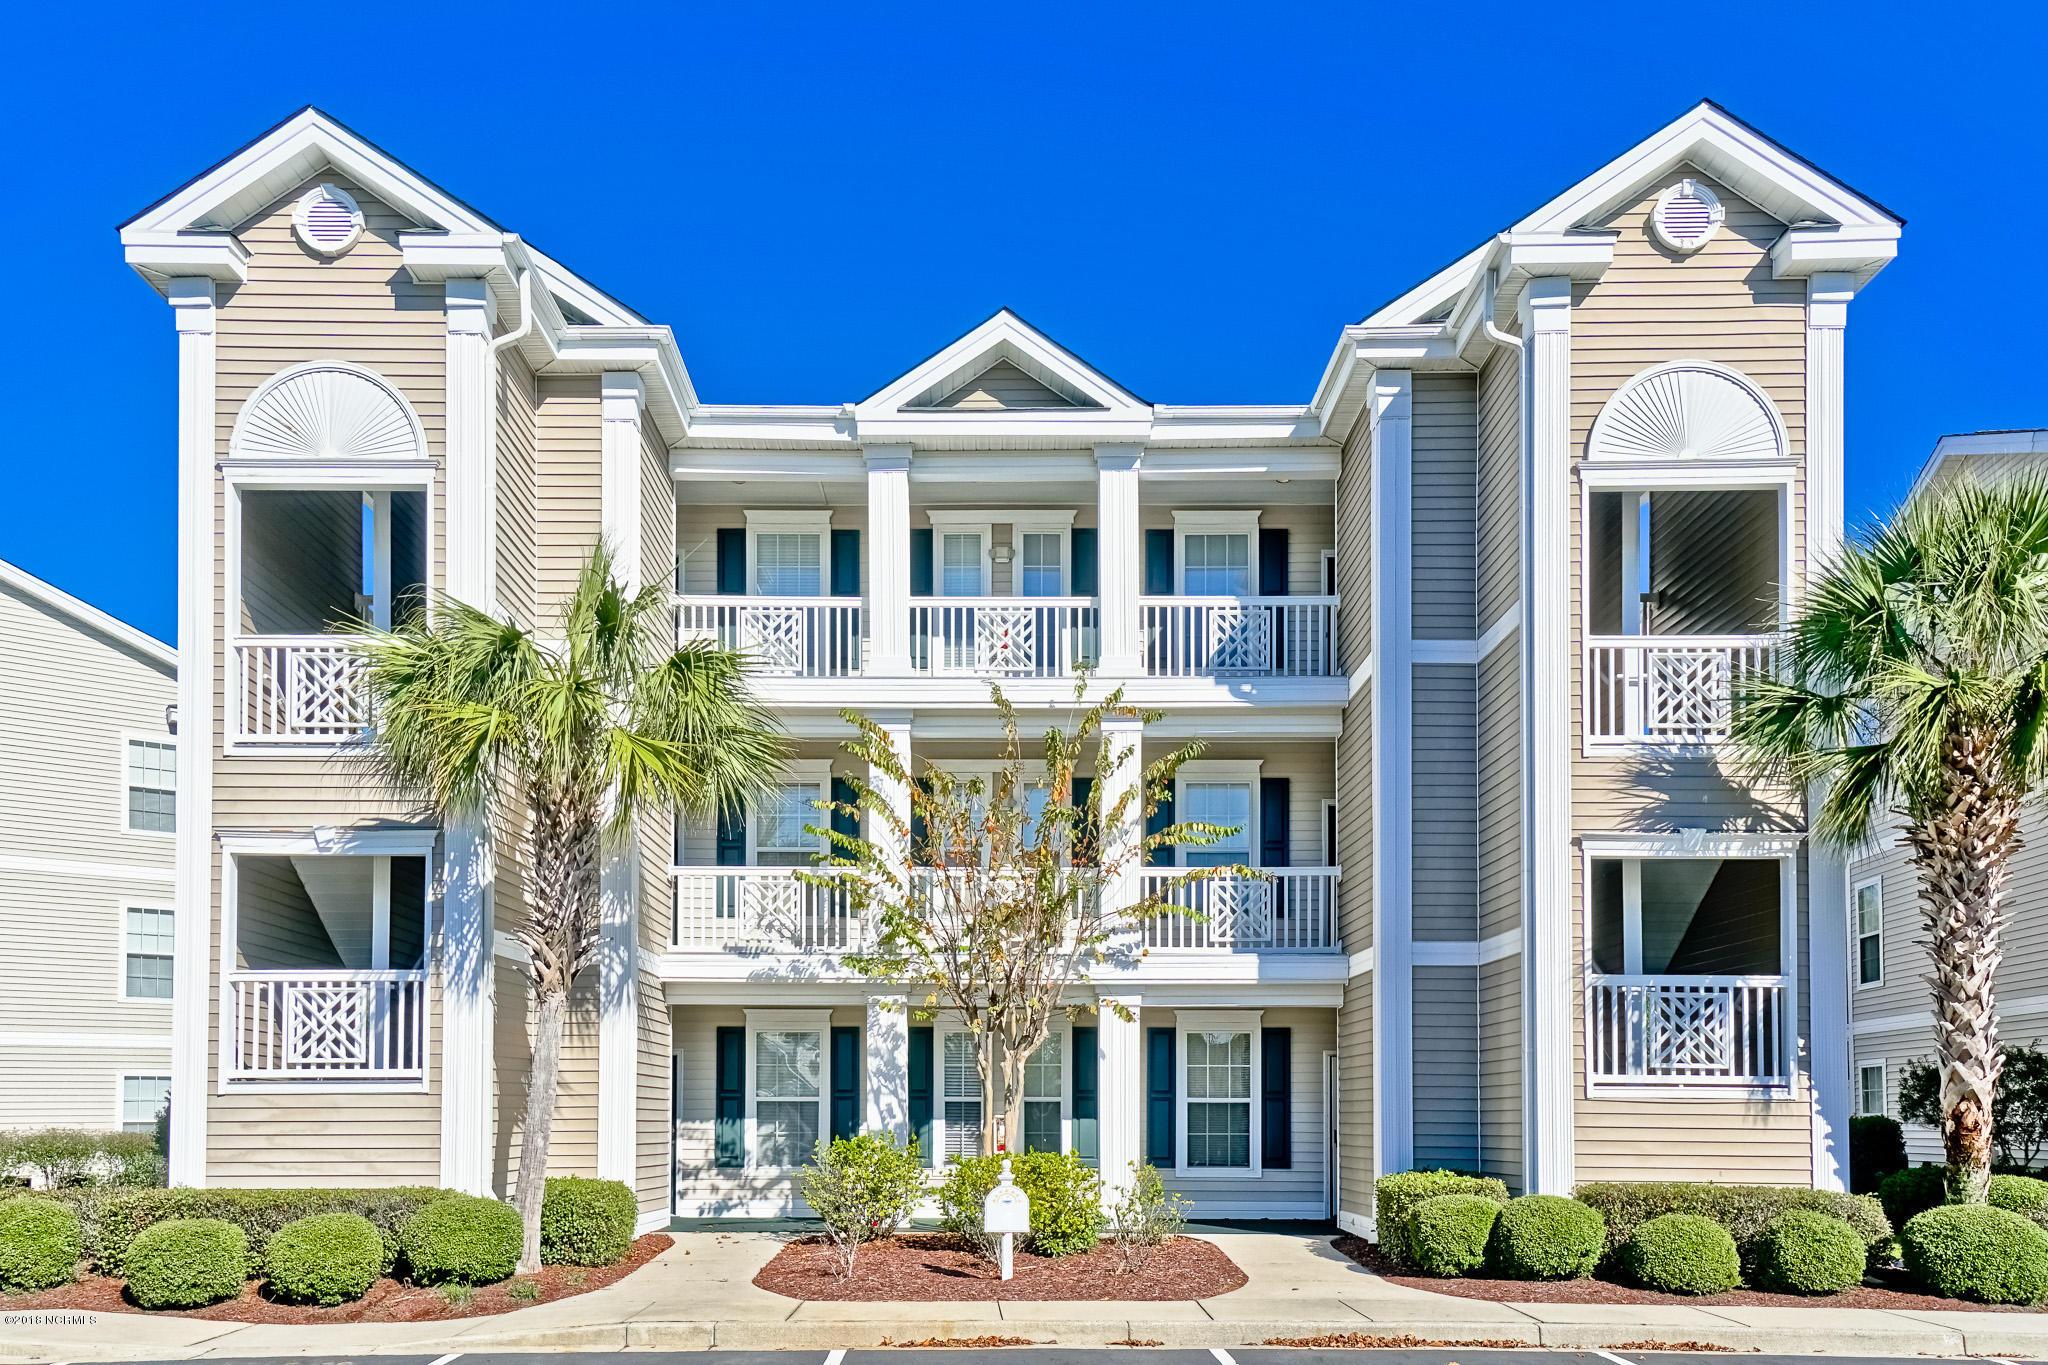 Carolina Plantations Real Estate - MLS Number: 100140643